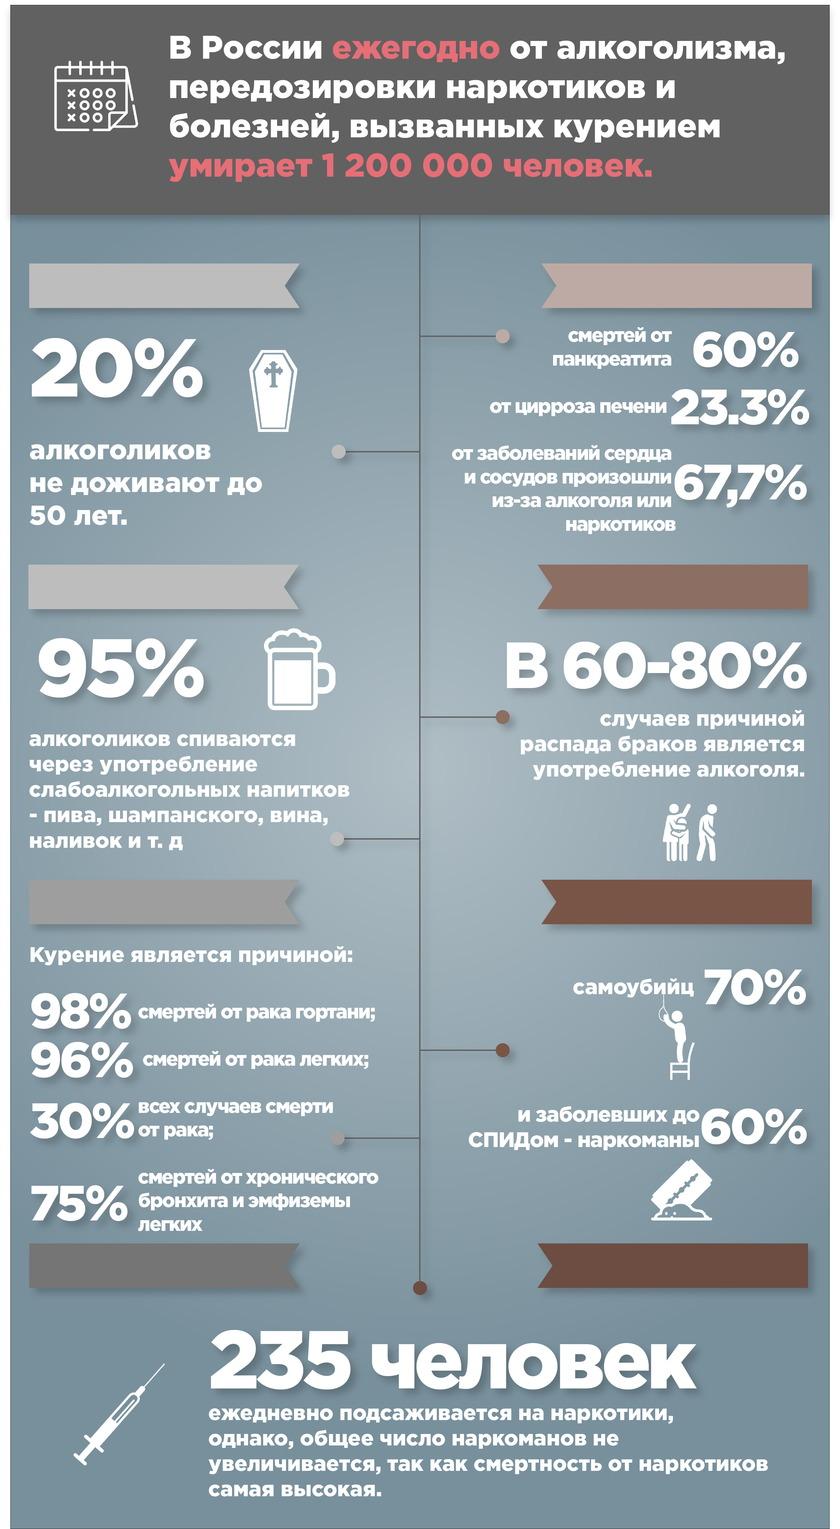 Статистика смертности от алкоголизма, наркомании и курения